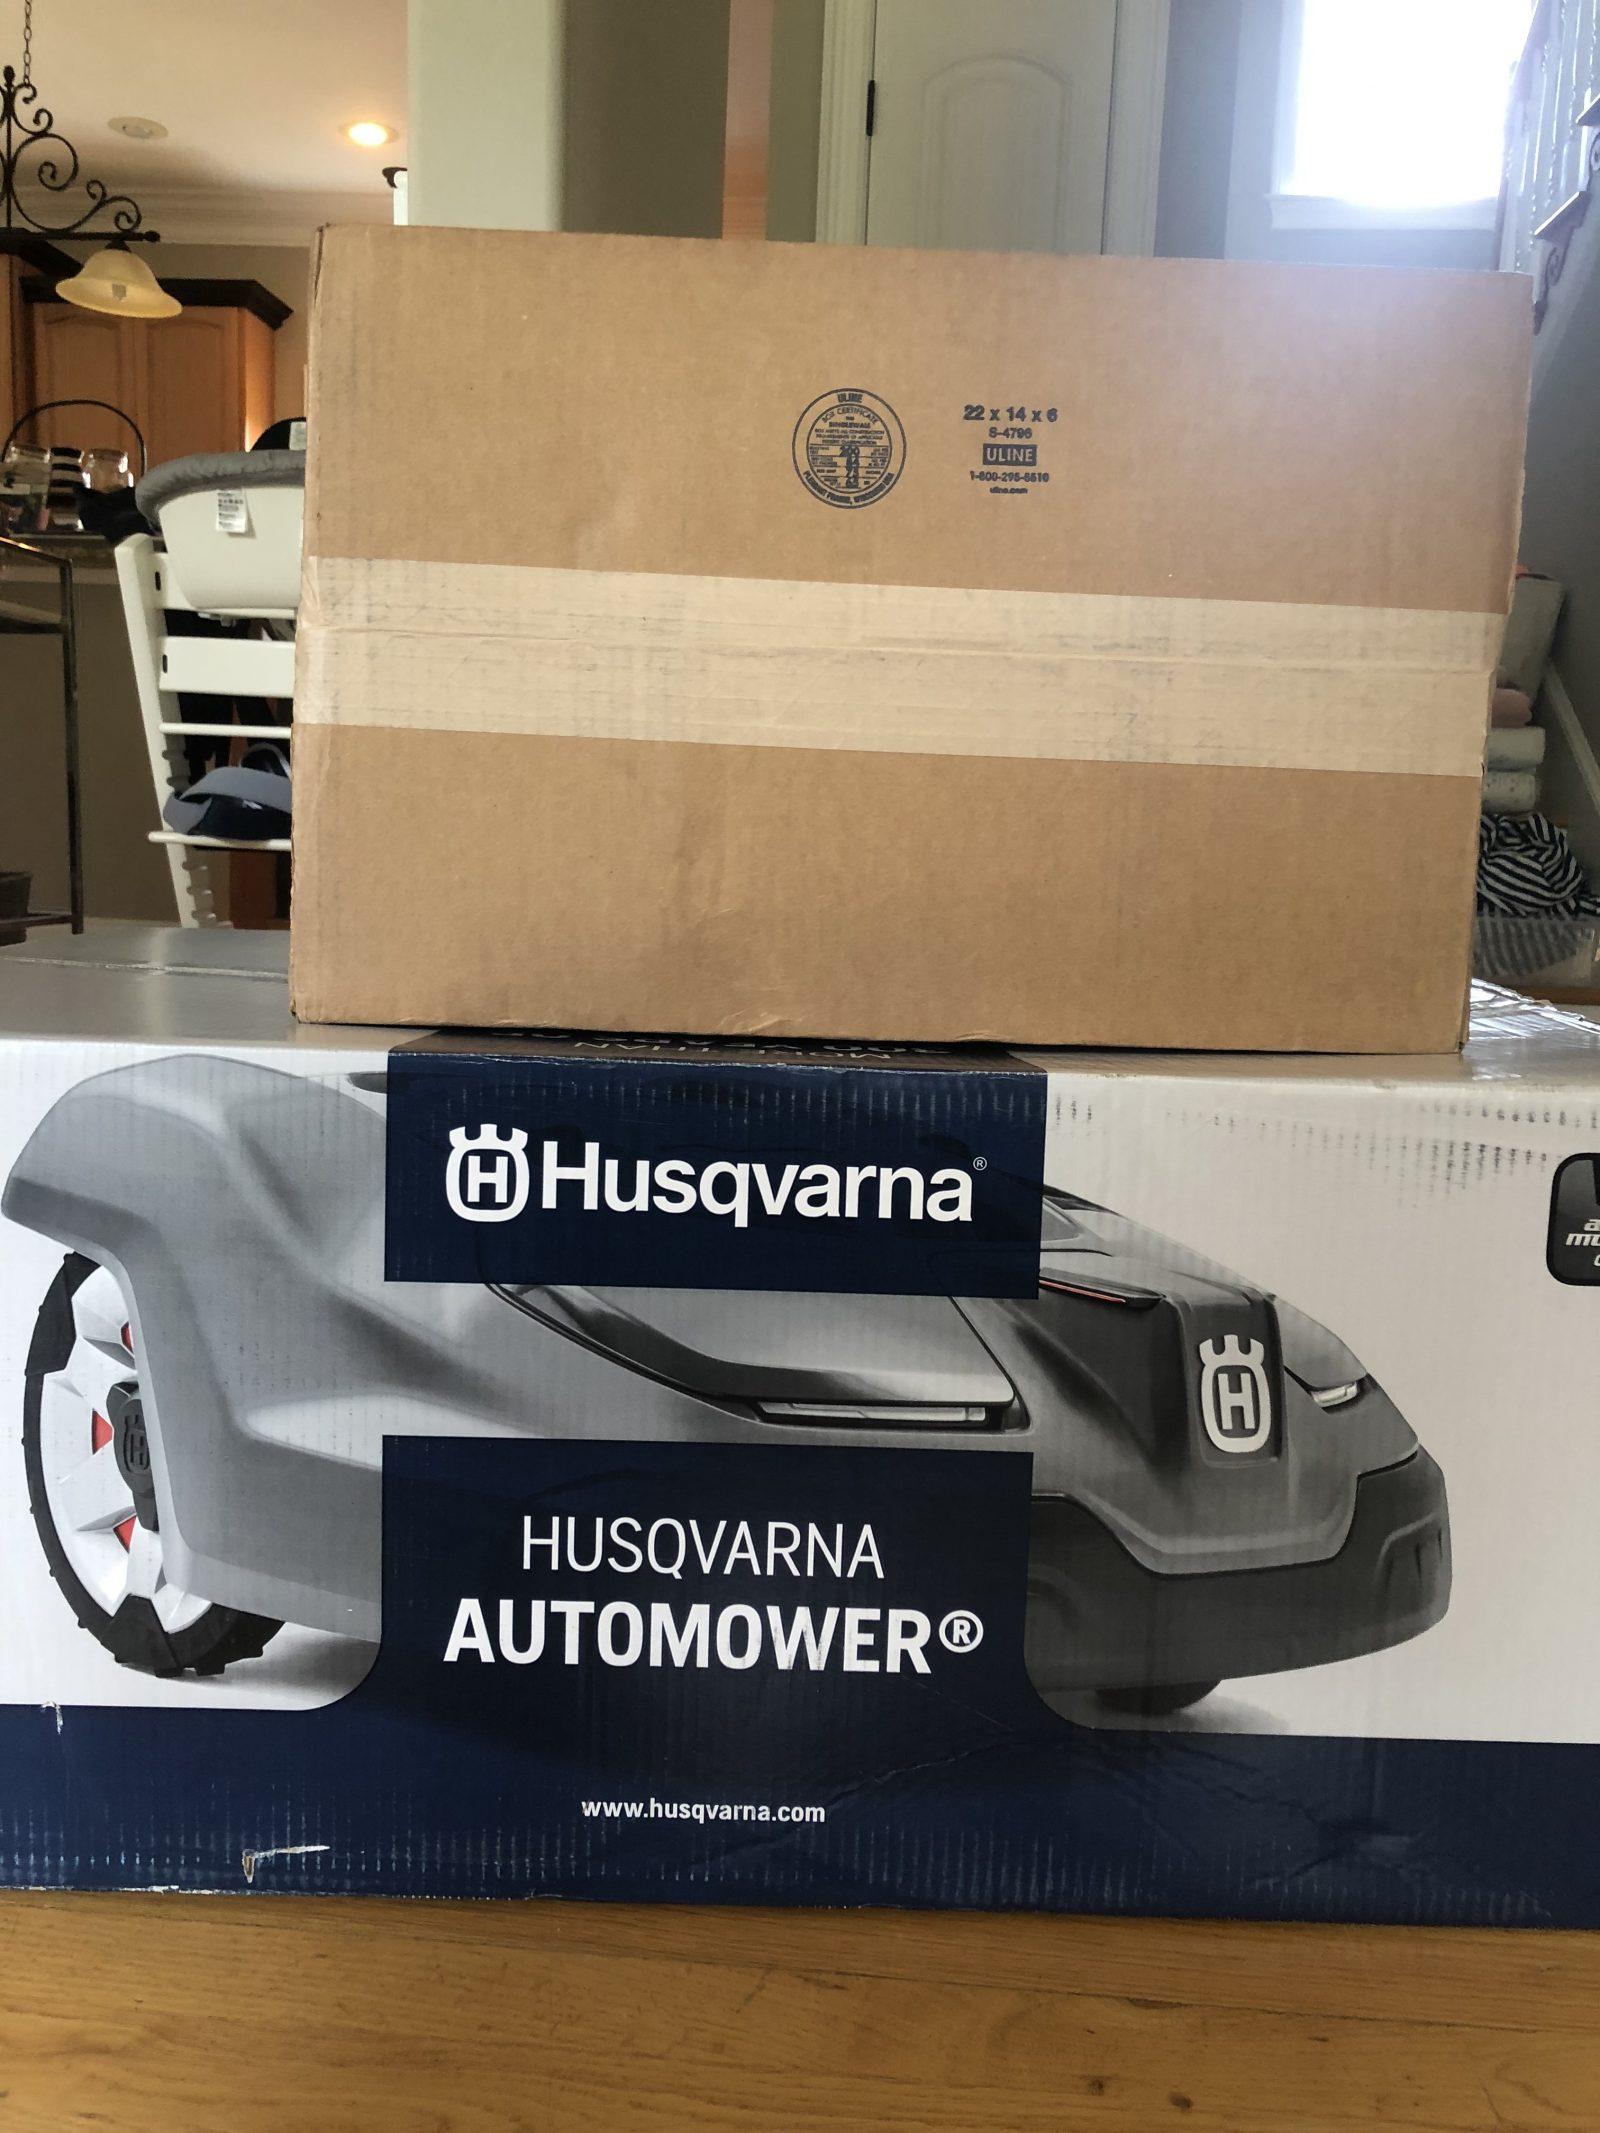 Husqvarna AutoMower Review - Robot Mower